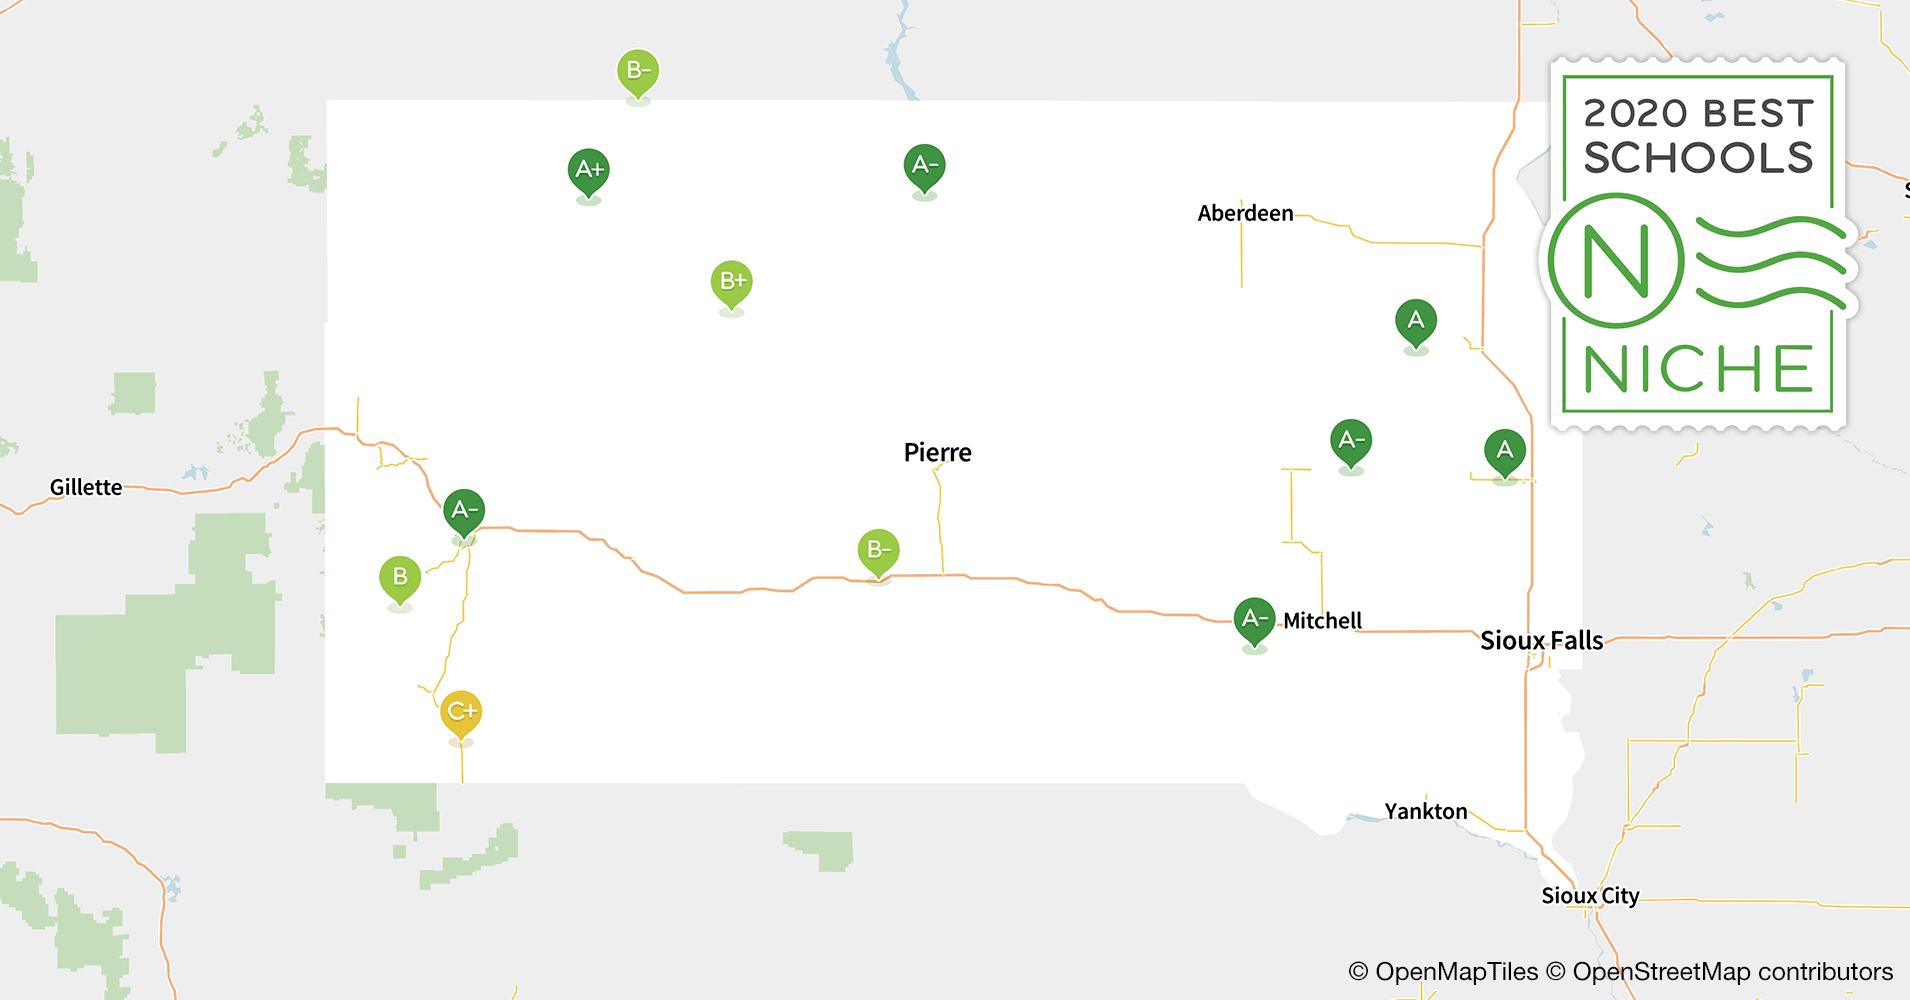 2020 Largest High Schools in South Dakota - Niche